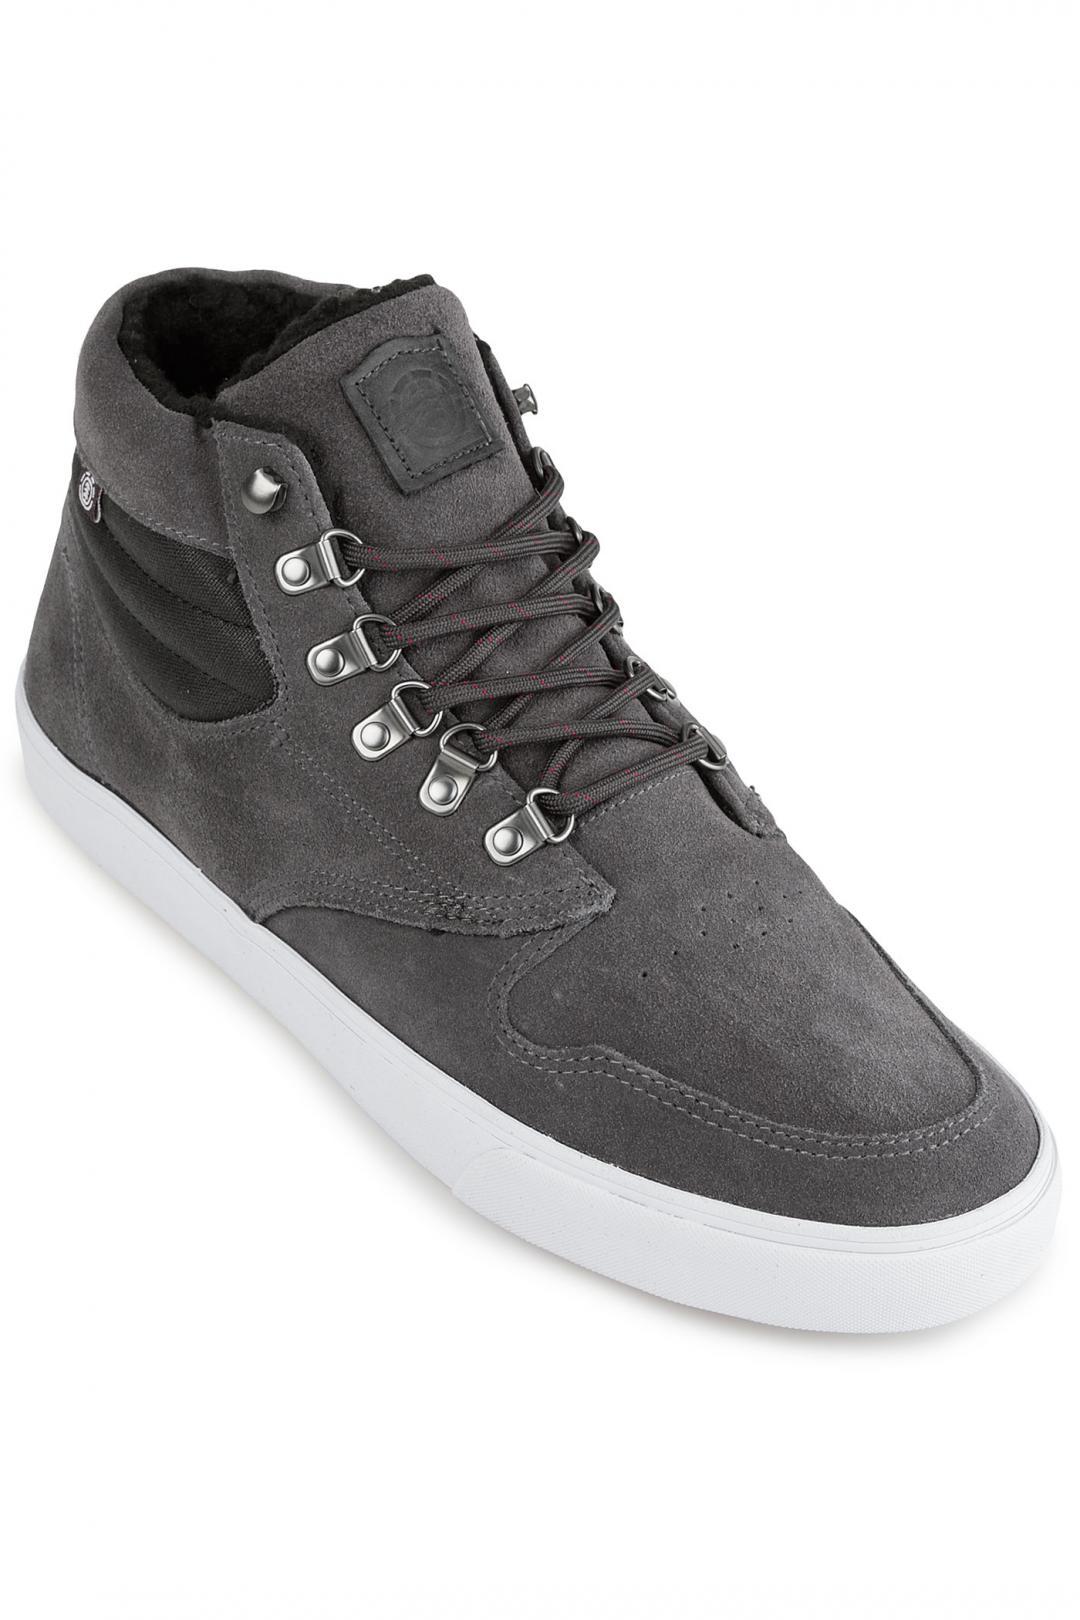 Uomo Element Topaz C3 Mid asphalt | Sneaker